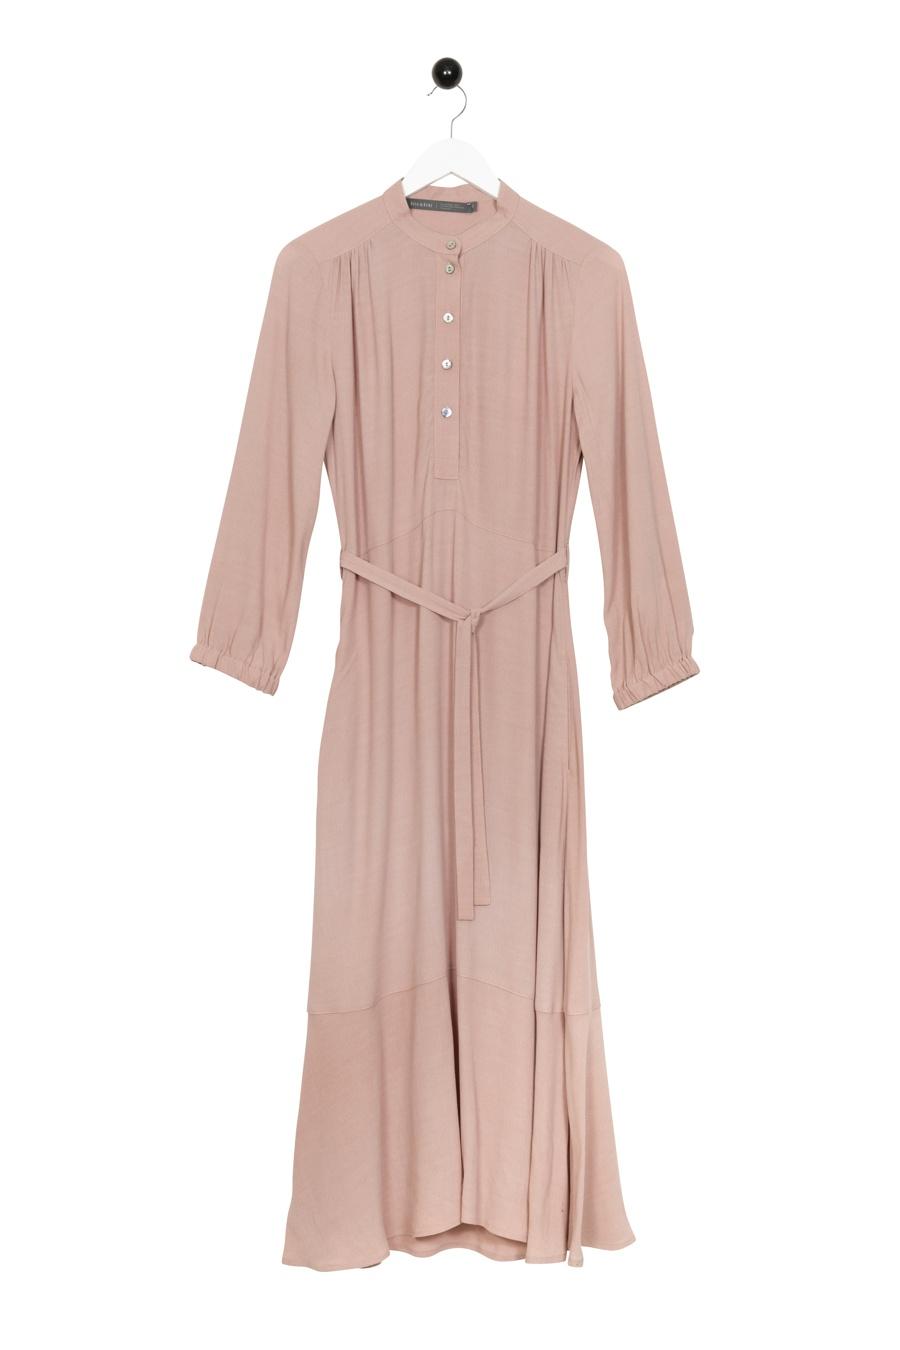 Liljeholmen Dress